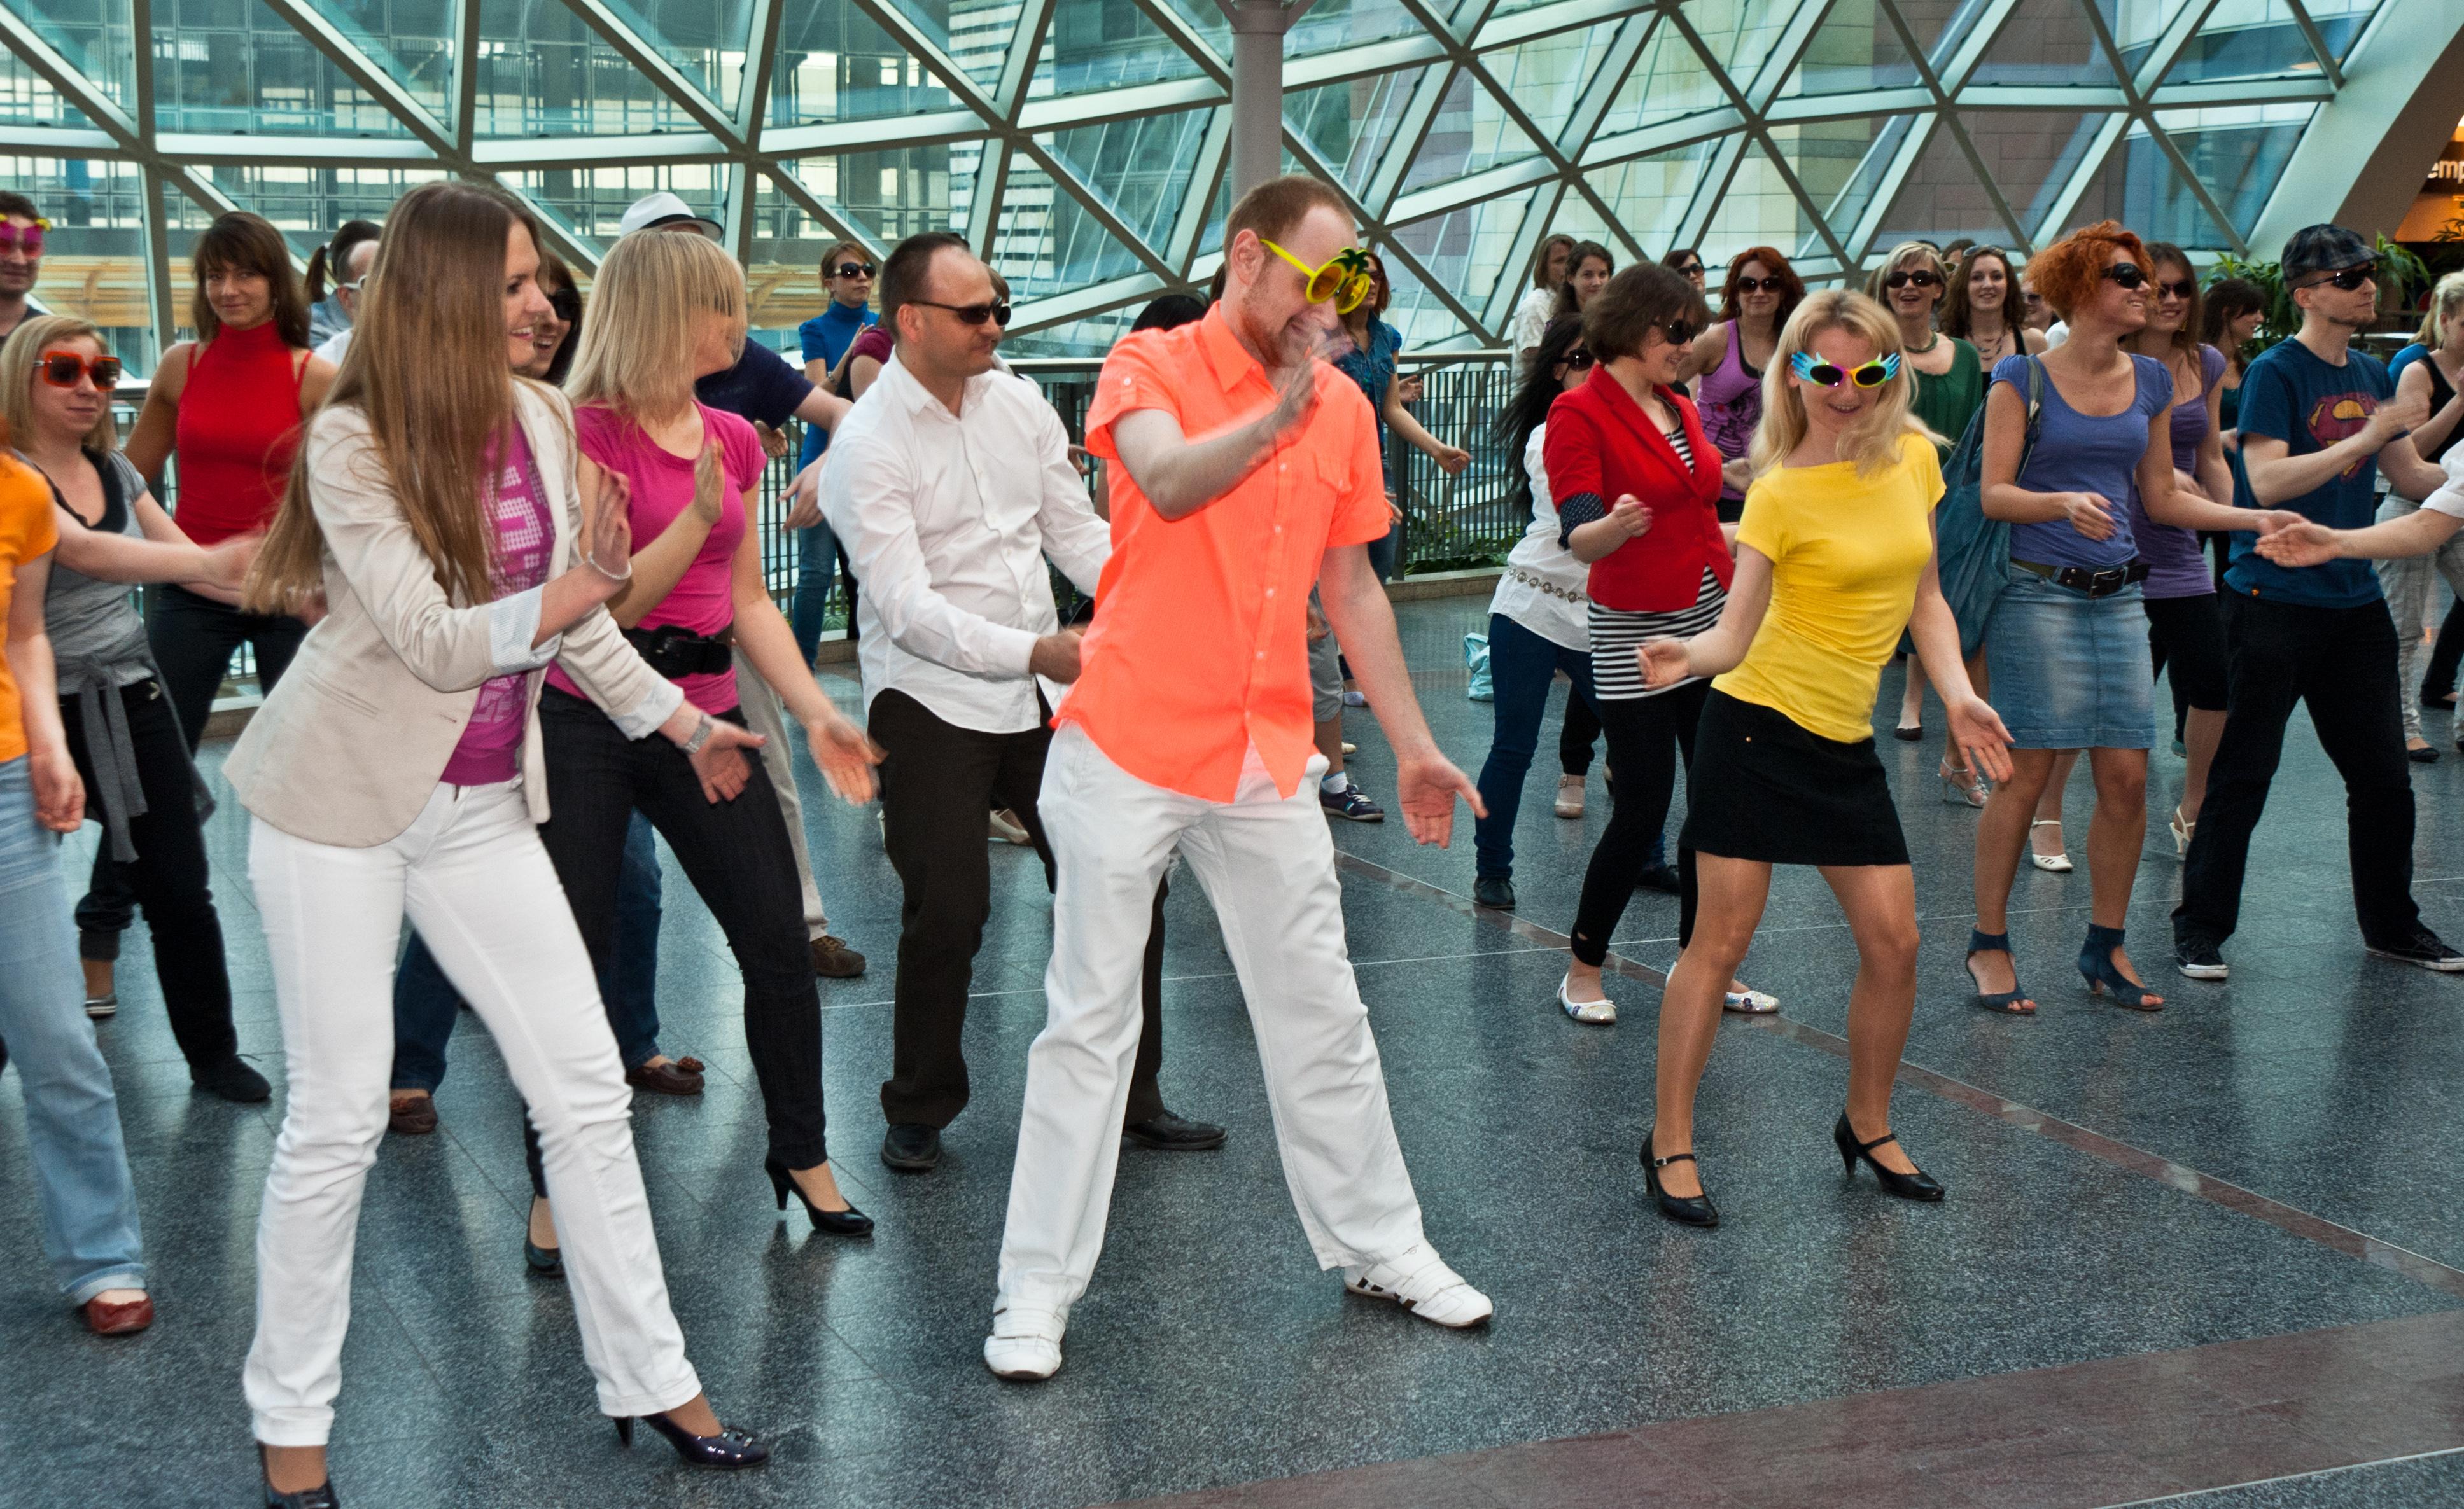 Flashmob - what is it